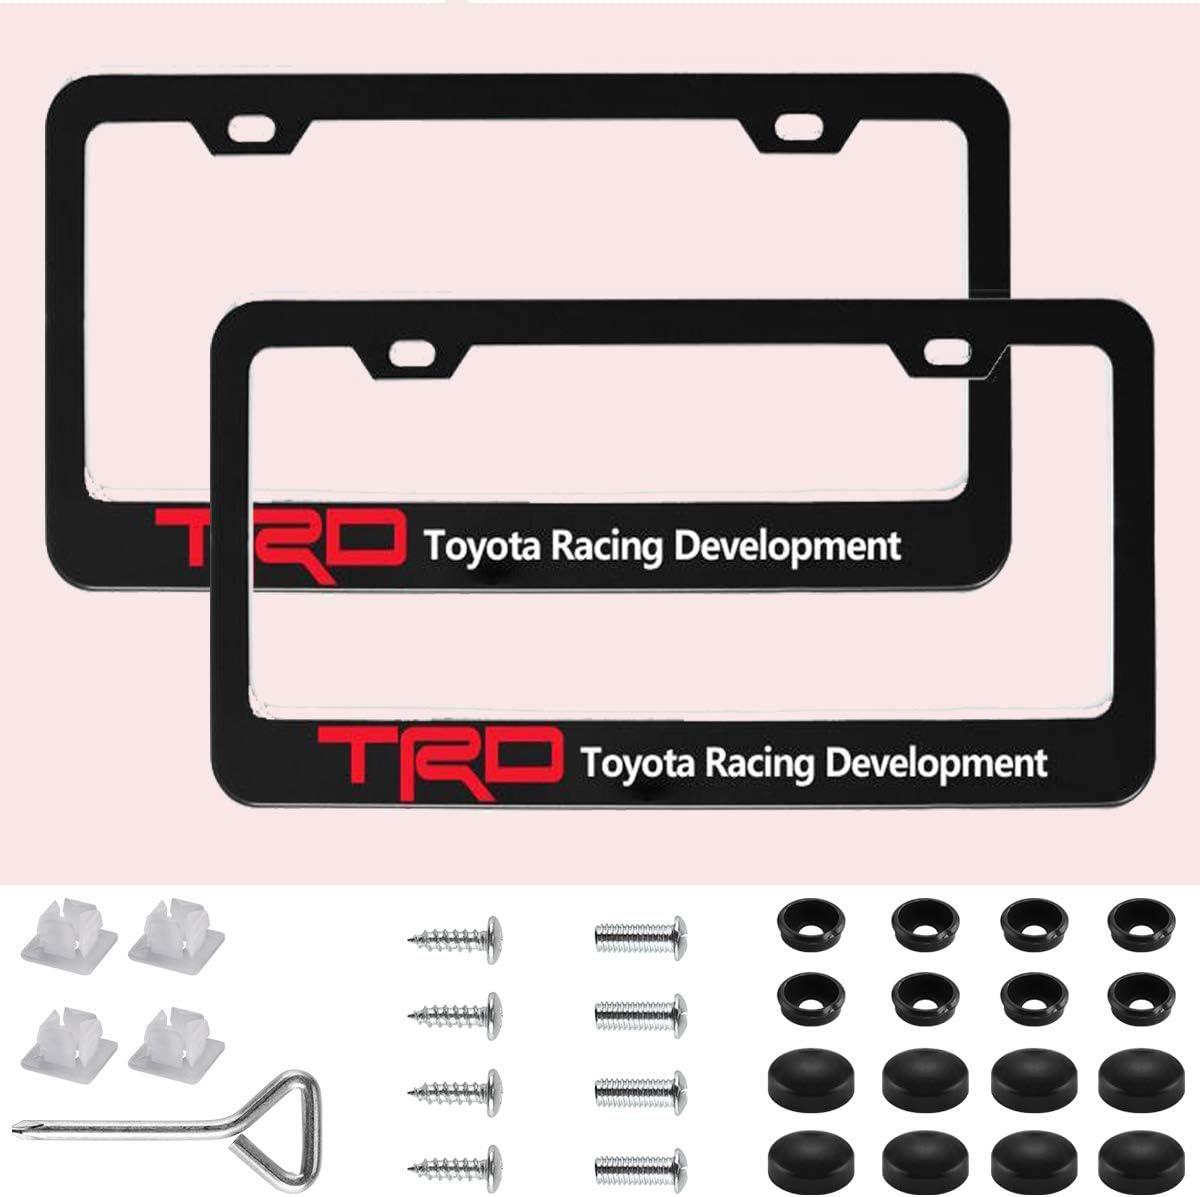 for Toyota TRD.(Black) Sparkle-um 2Pcs Newest Matte Aluminum Alloy TRD Logo License Plate Frame,with Screw Caps Cover Set,Applicable to US Standard car License Frame